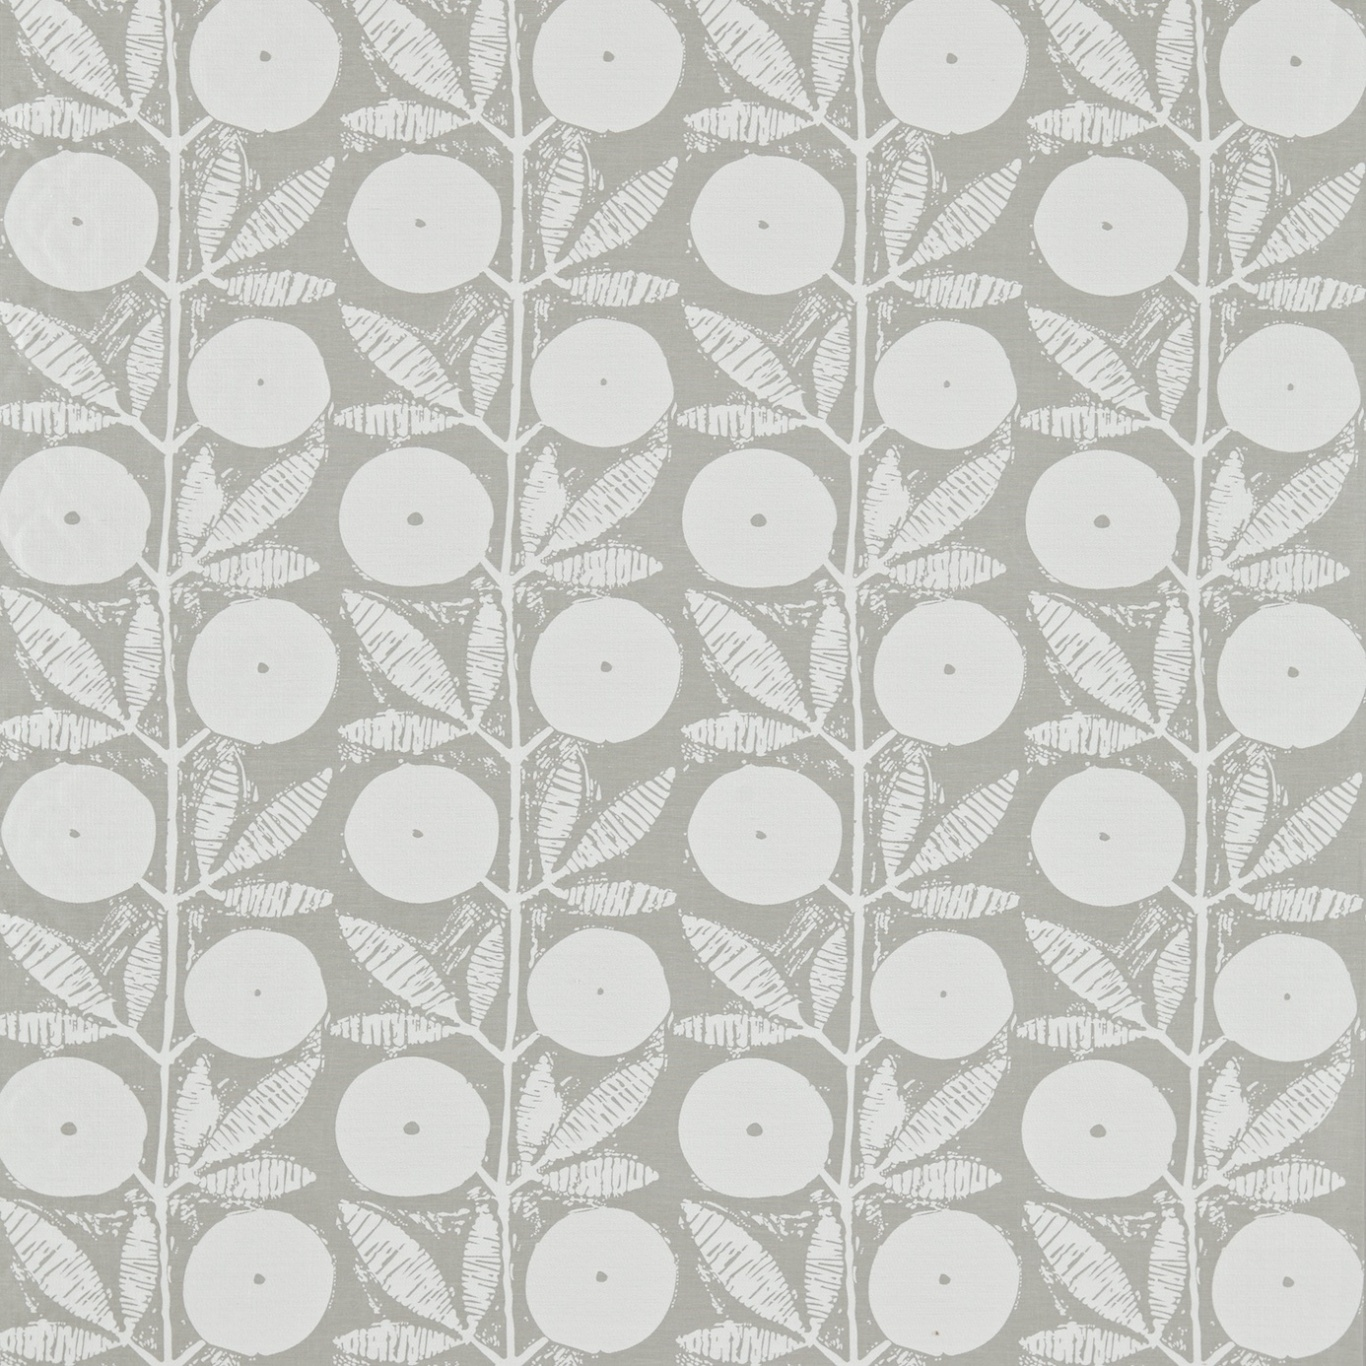 Image of Scion Somero Pewter/Pumice Curtain Fabric 131535